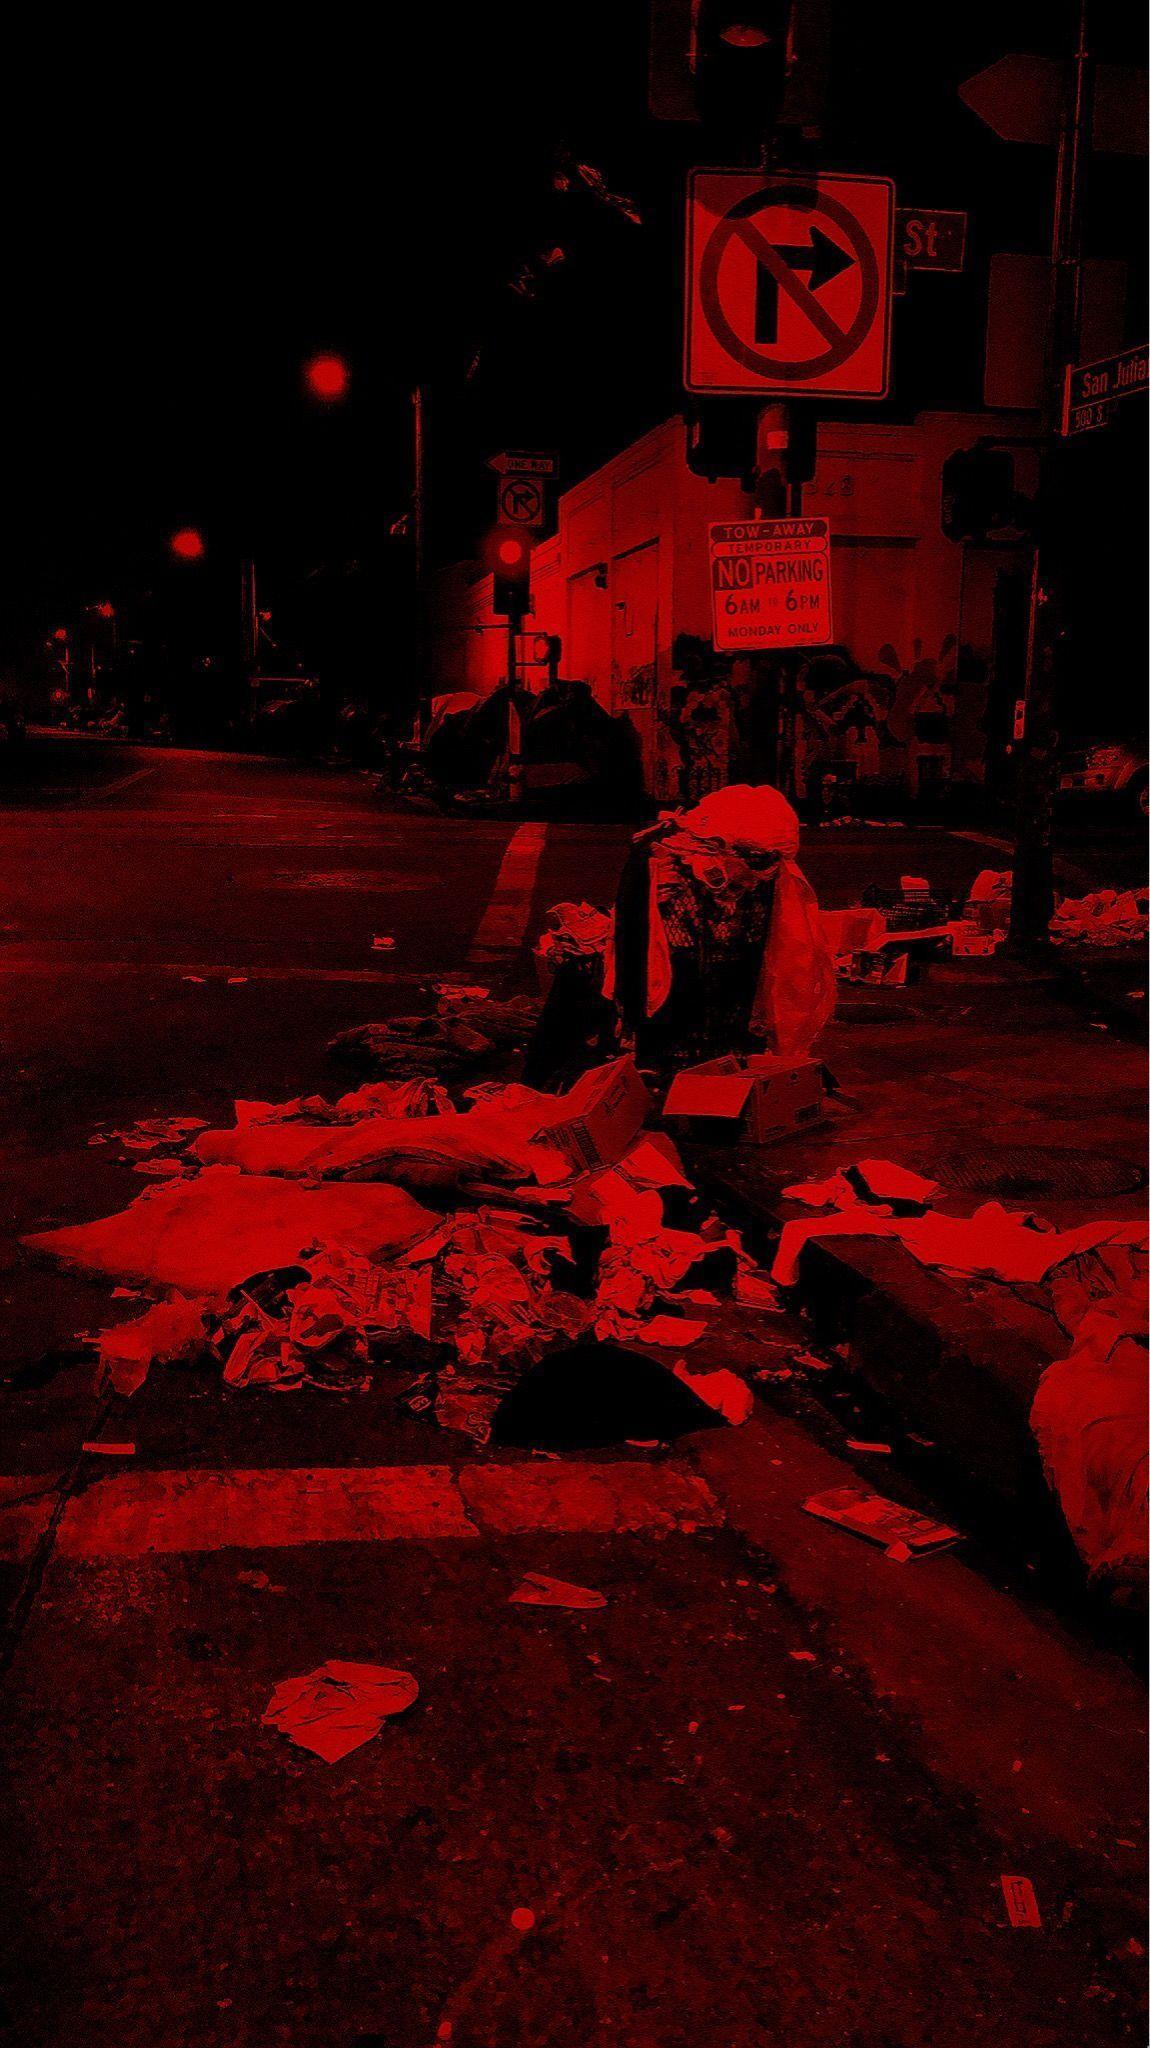 aesthetic dark wallpapers blood grunge rojo fondos desktop backgrounds edgy fondo sfumature sfondi phone rojos ecosia paulmichael rainbow maroon colors